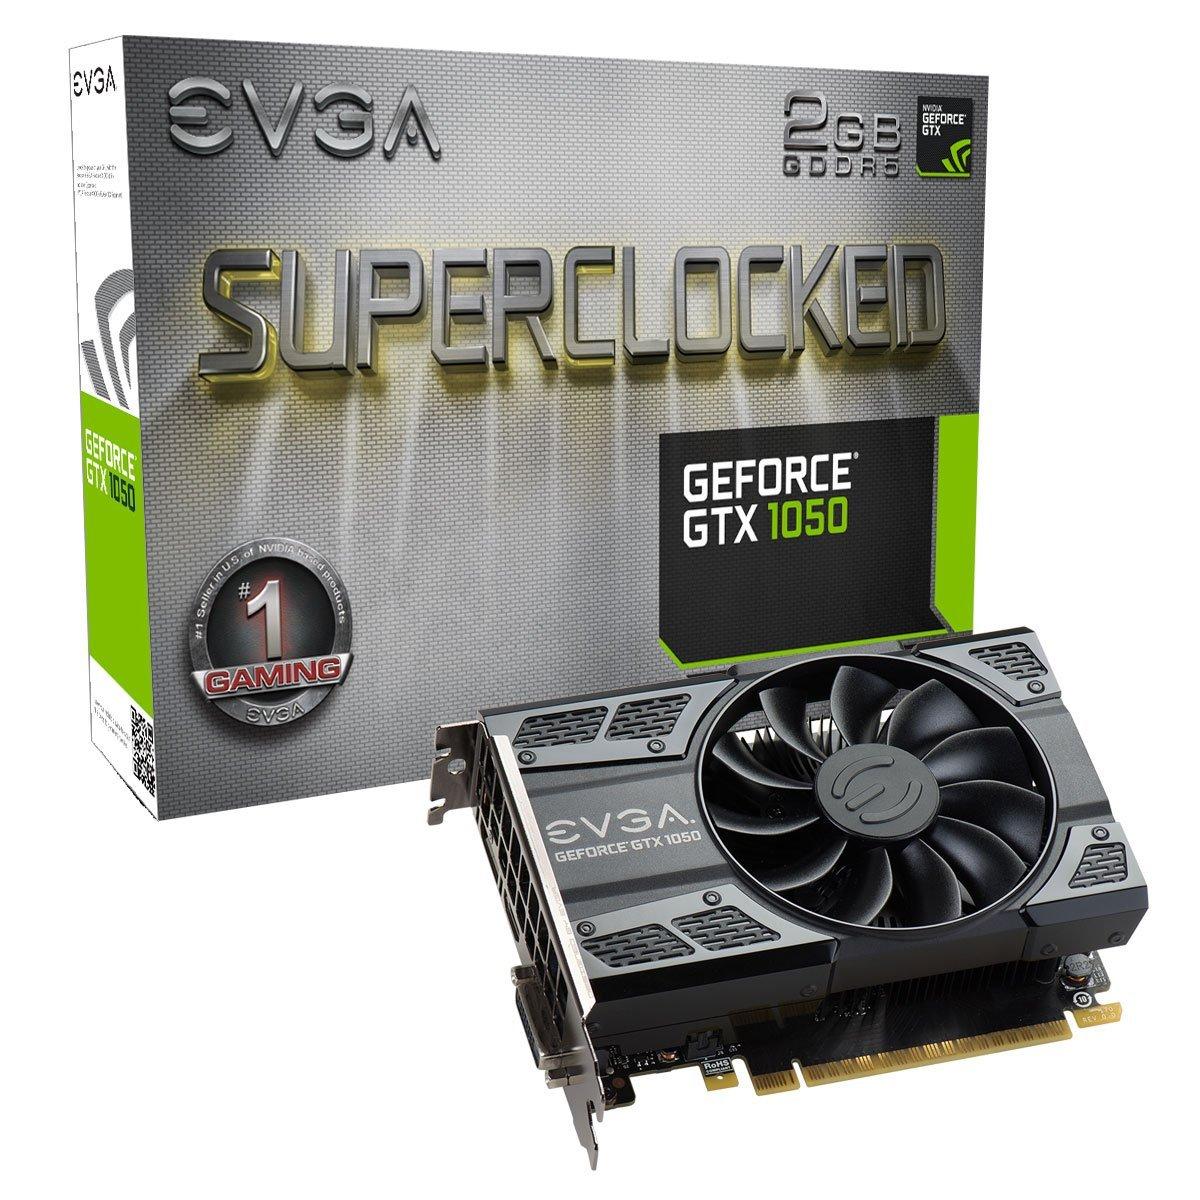 EVGA GeForce GTX 1050 2GB SC GAMING Graphics Card | 02G-P4-6152-KR